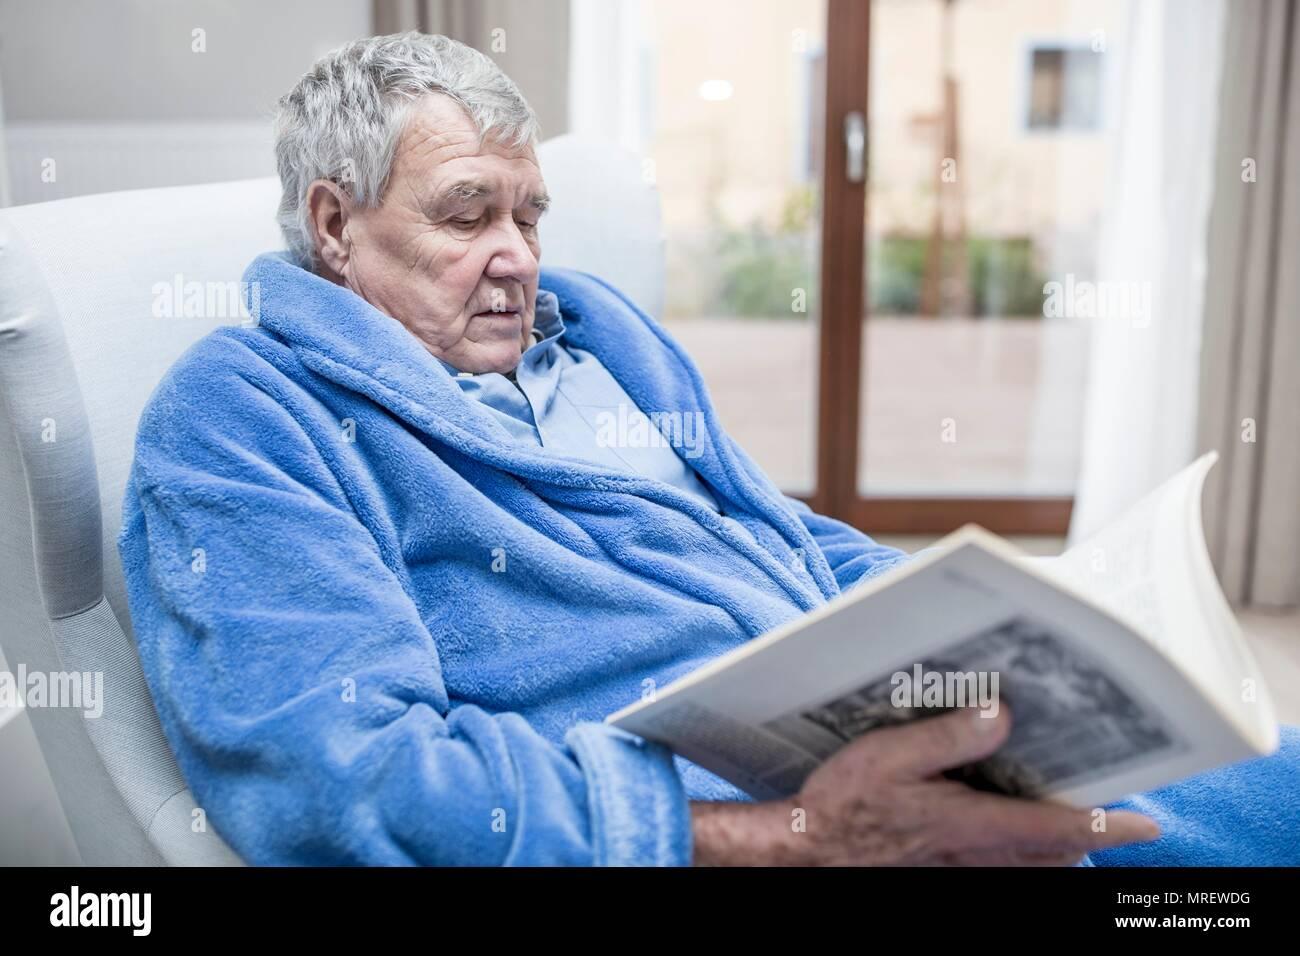 Senior man reading magazine in care home. - Stock Image